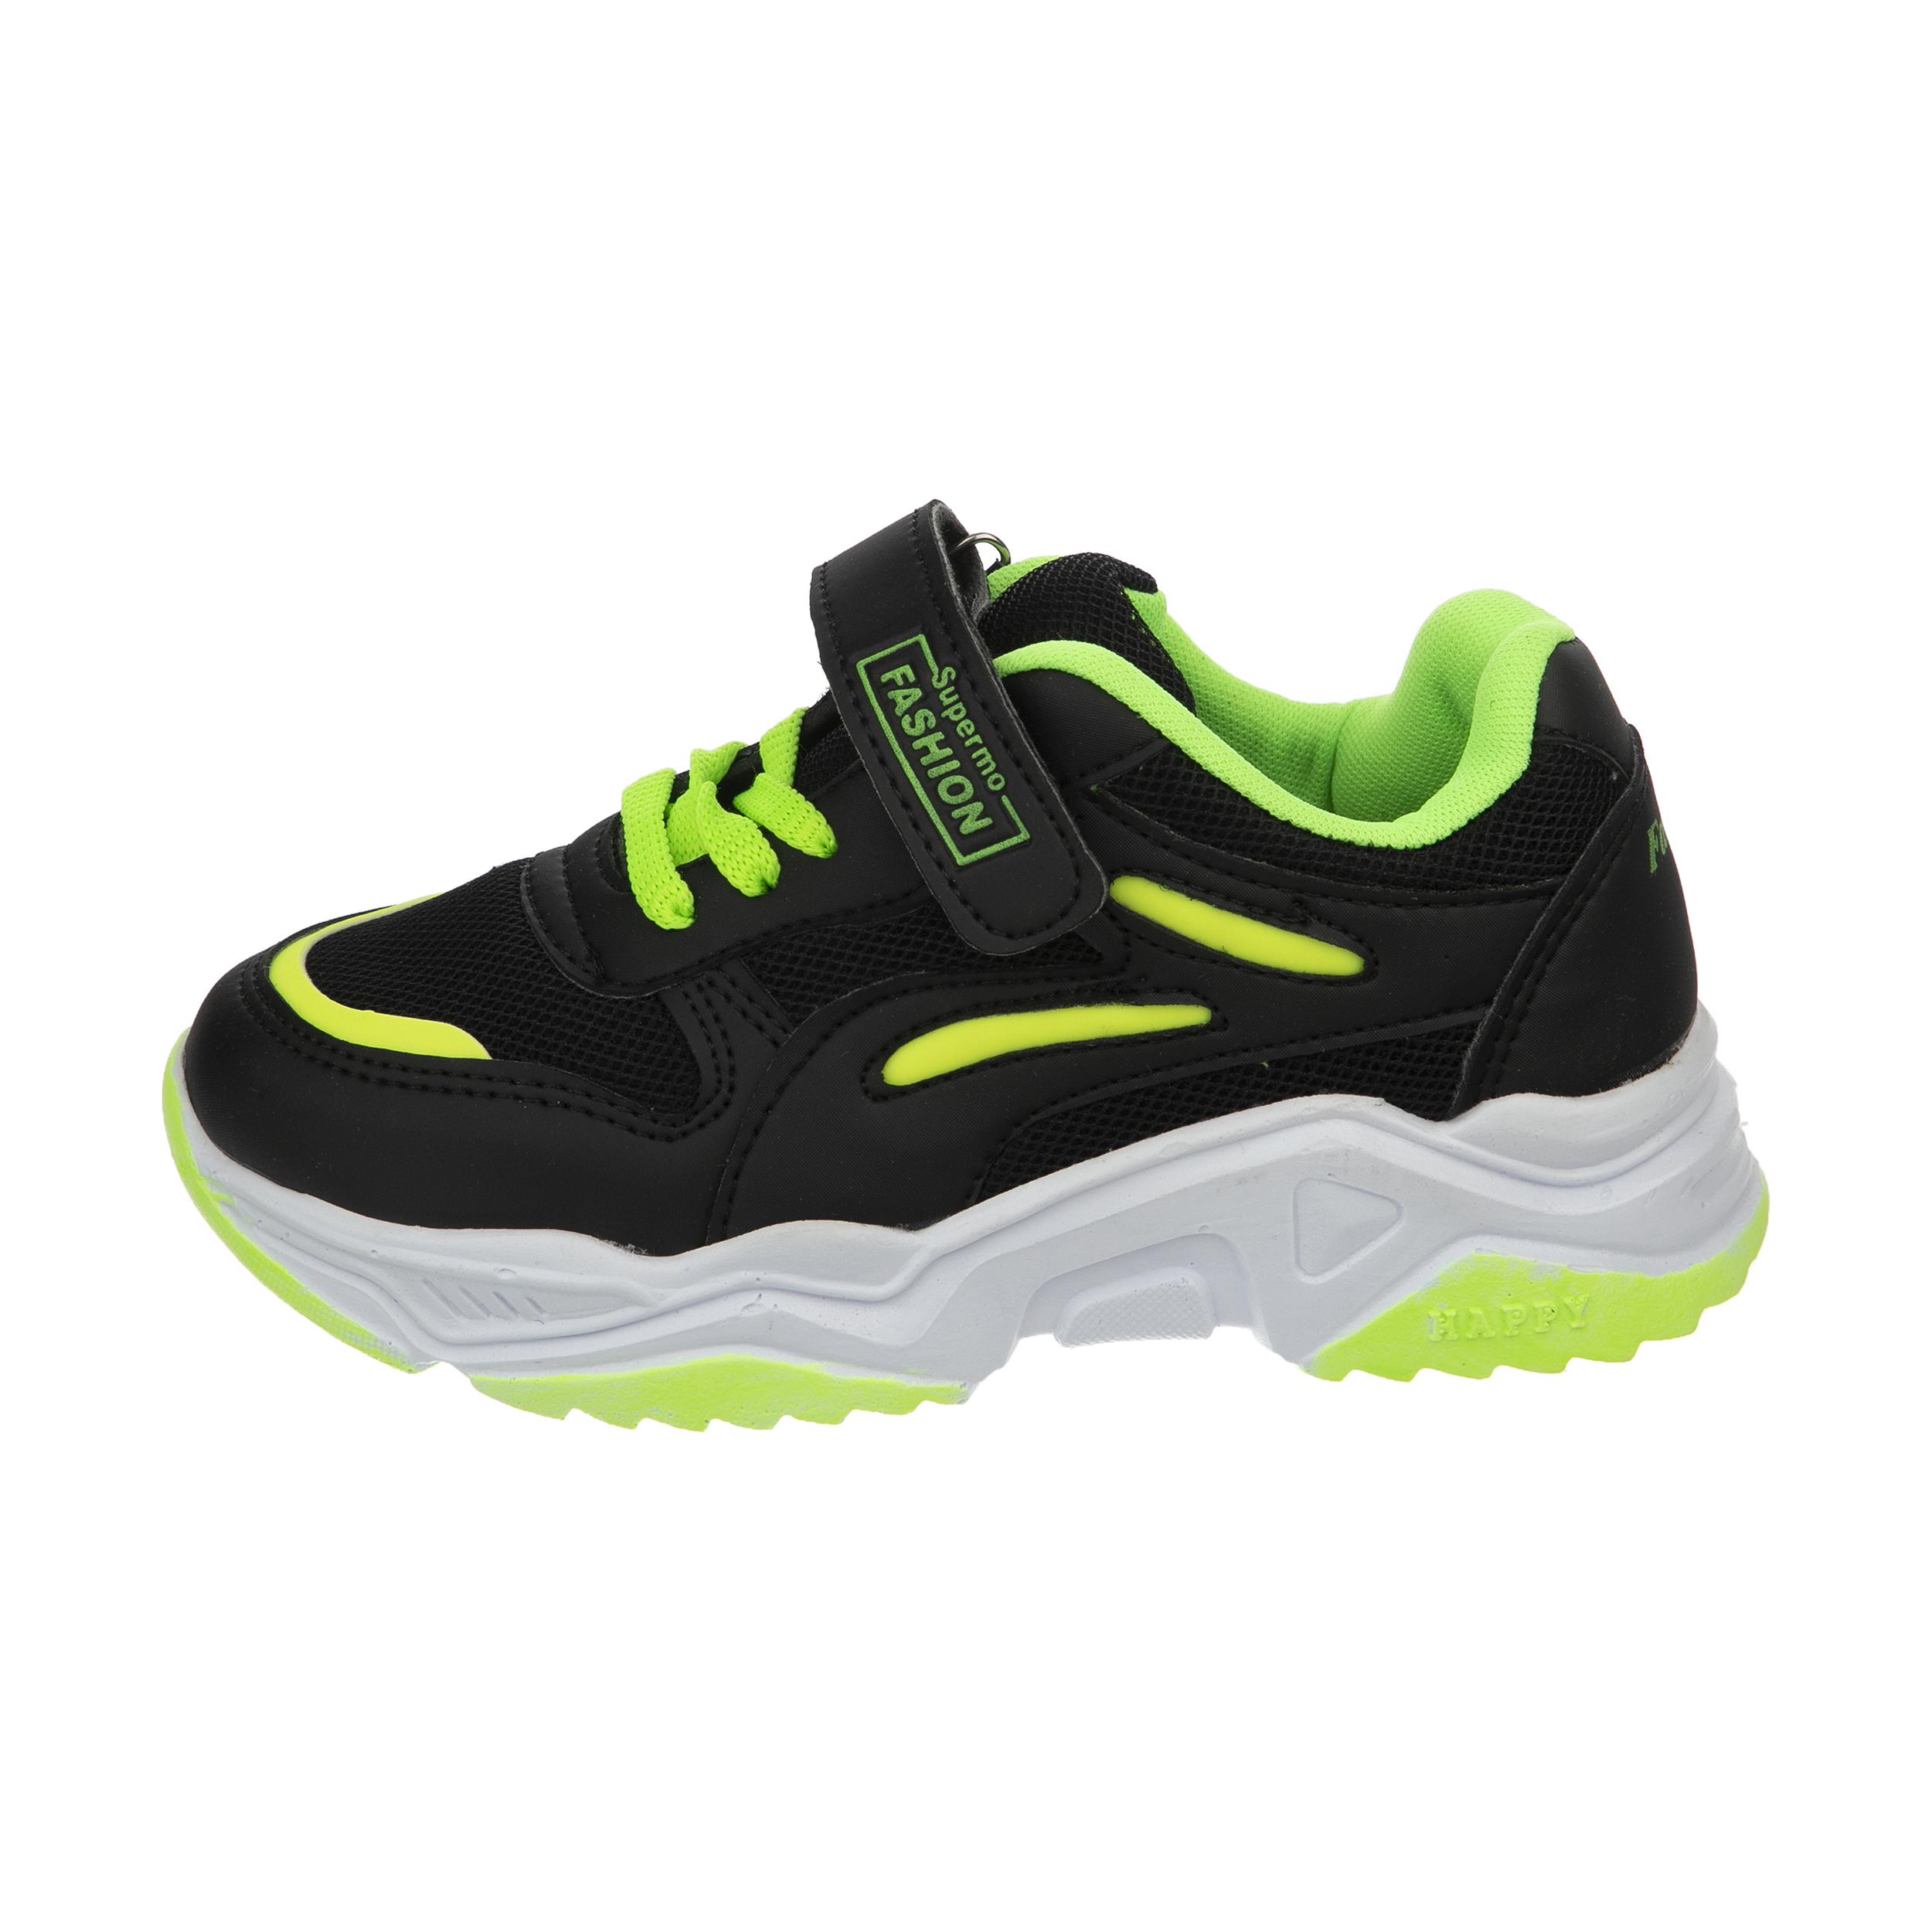 کفش پیاده روی بچگانه سوپرمو کد 008